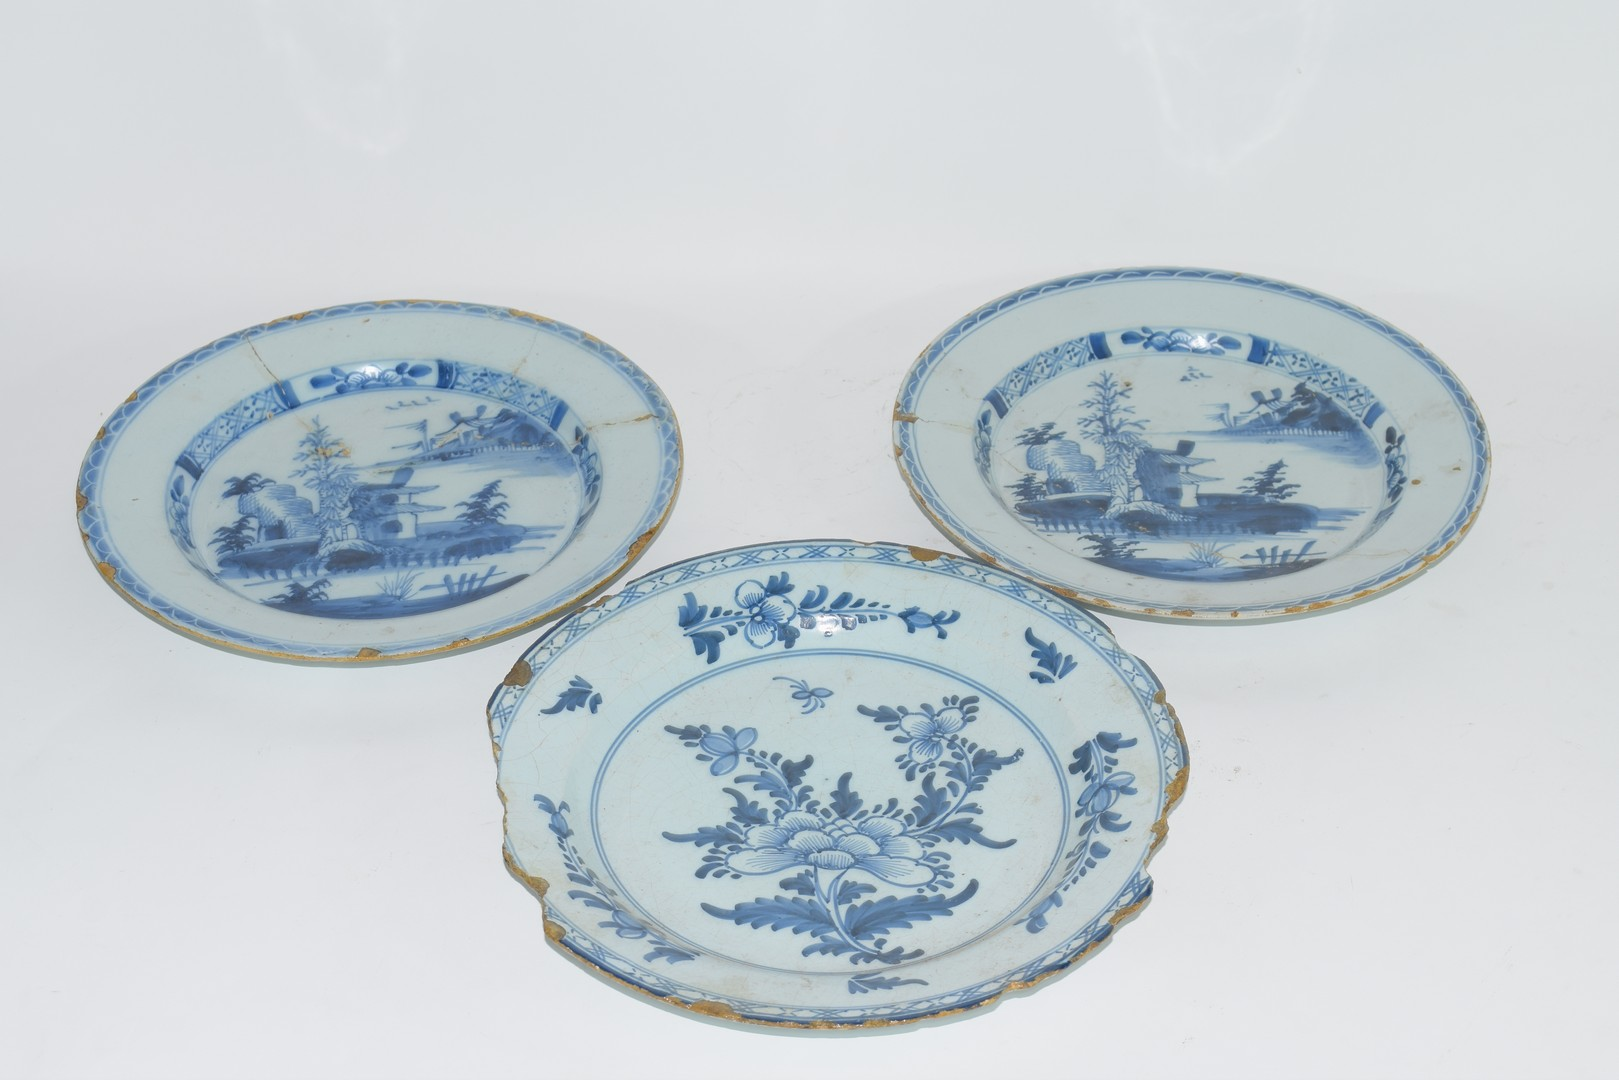 Three 18th century English Delft plates